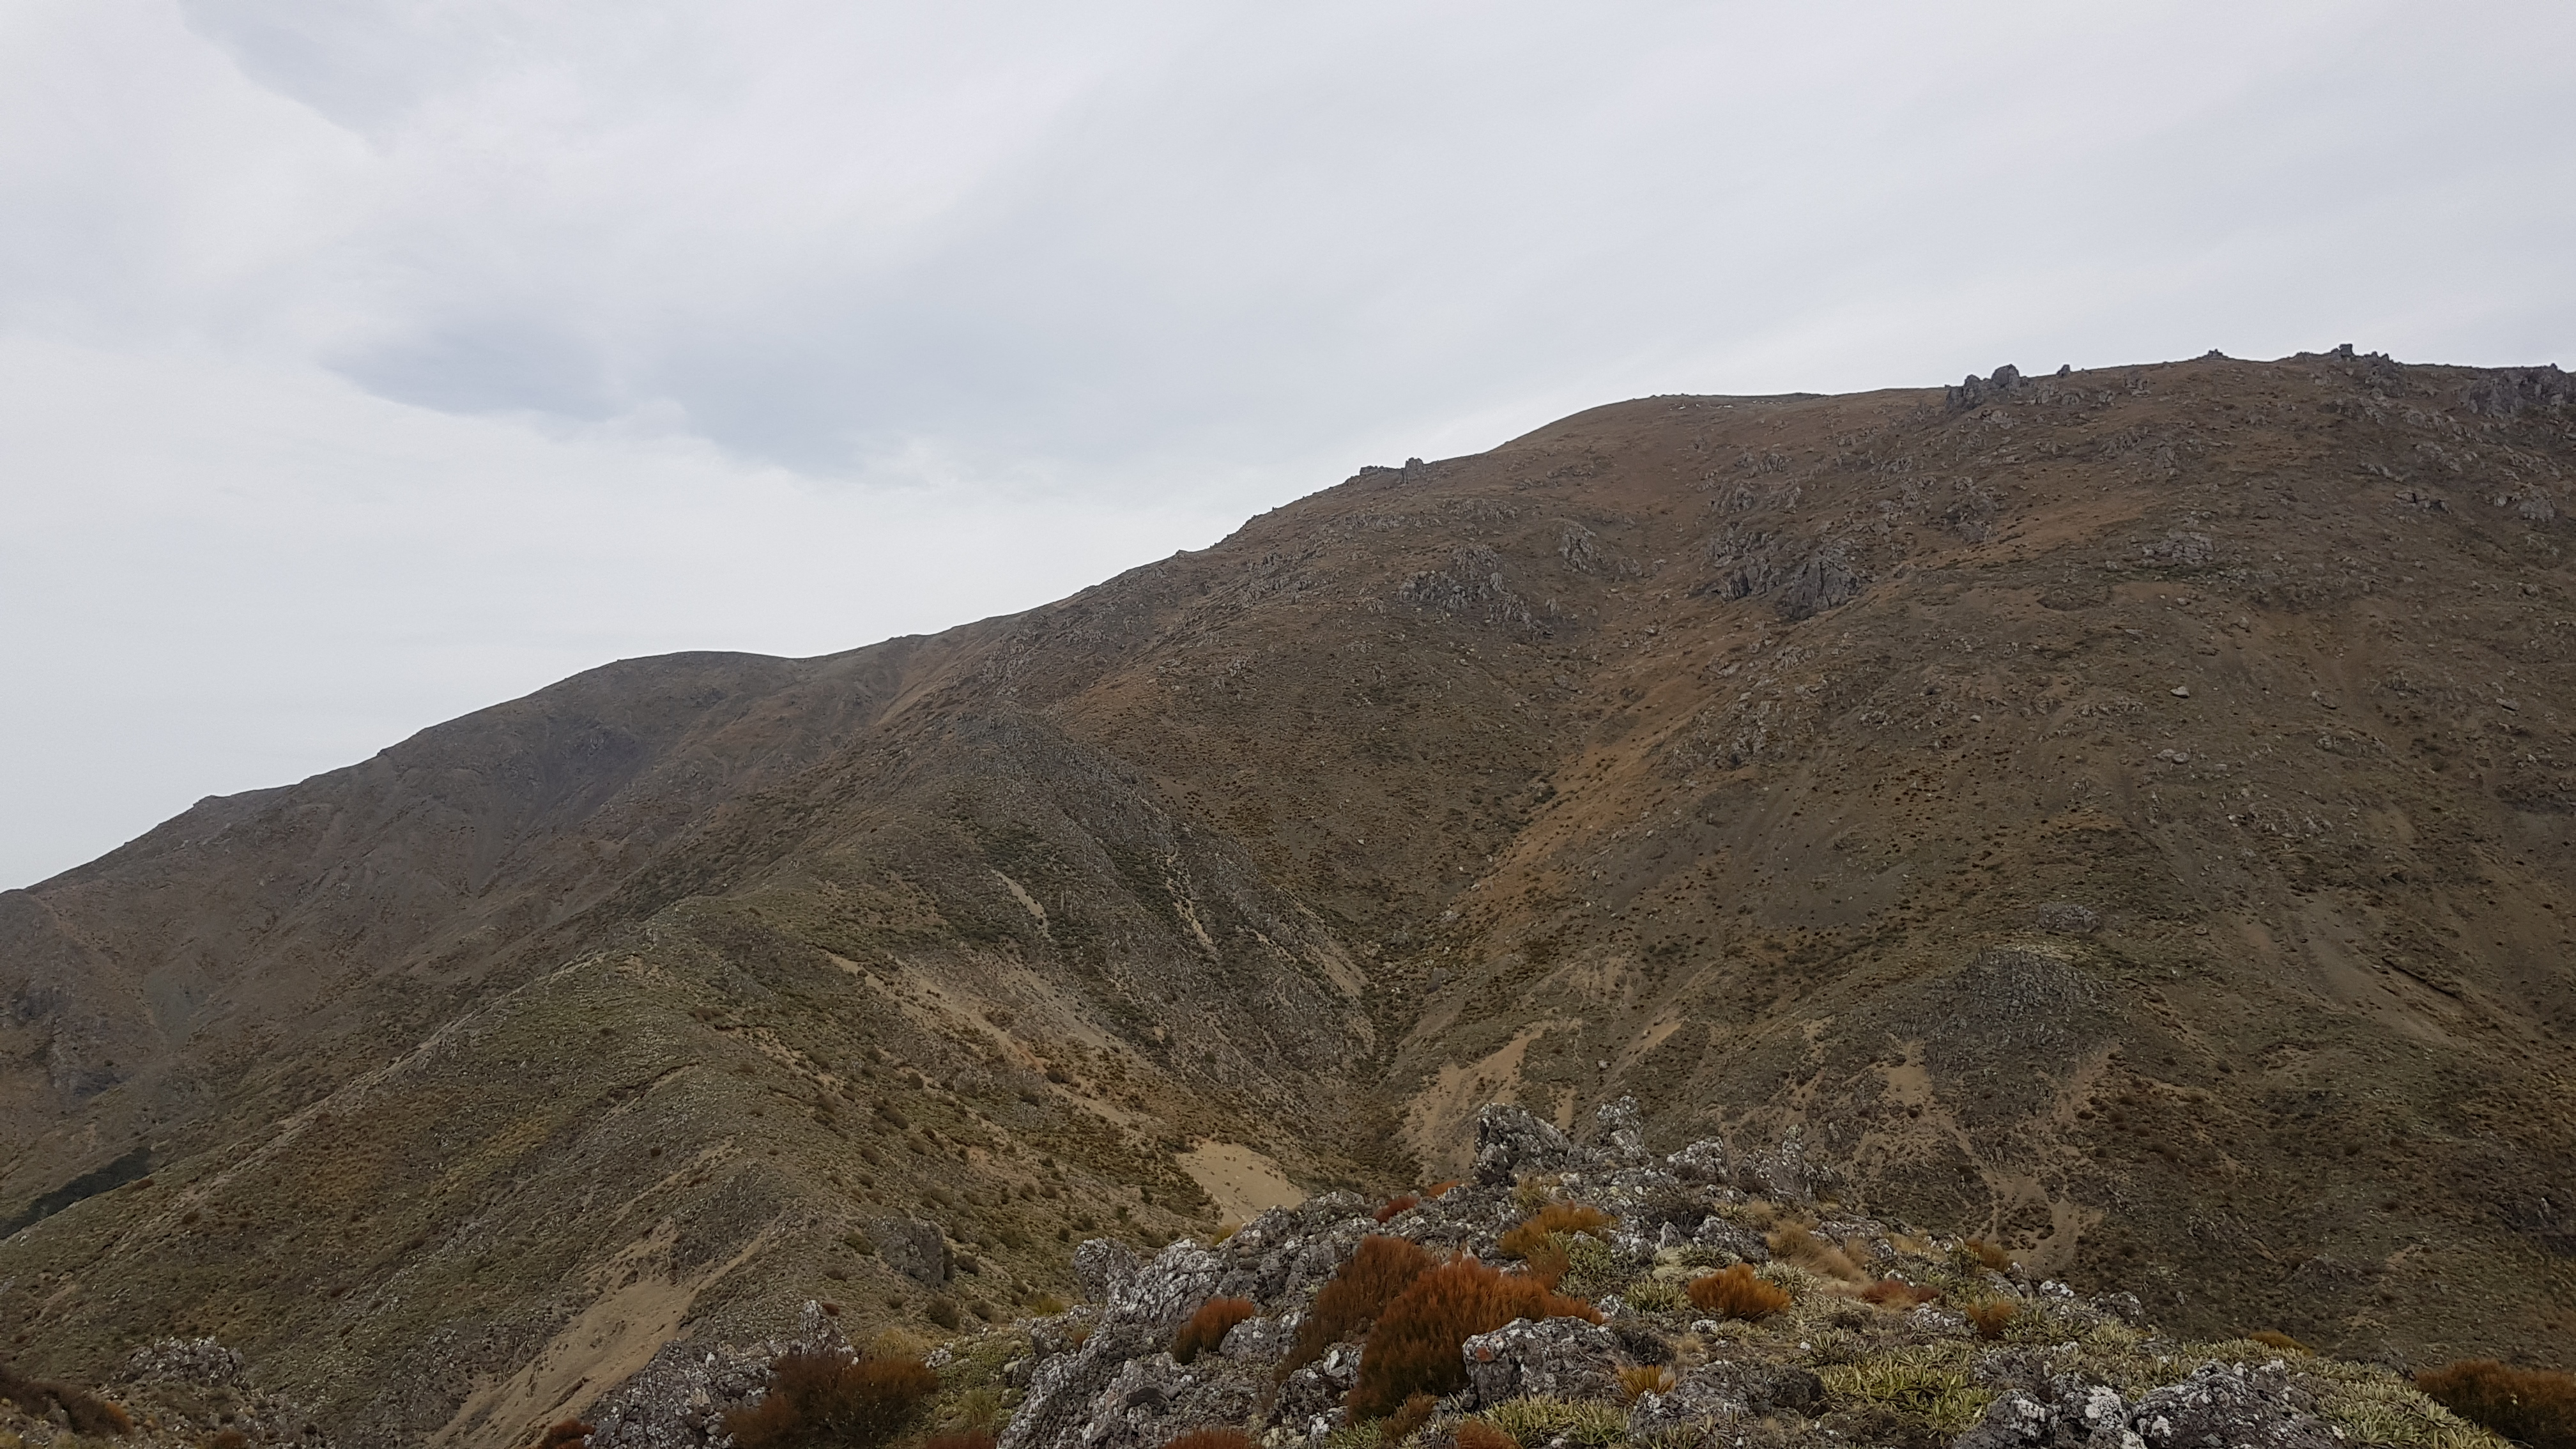 Blairich Mountain